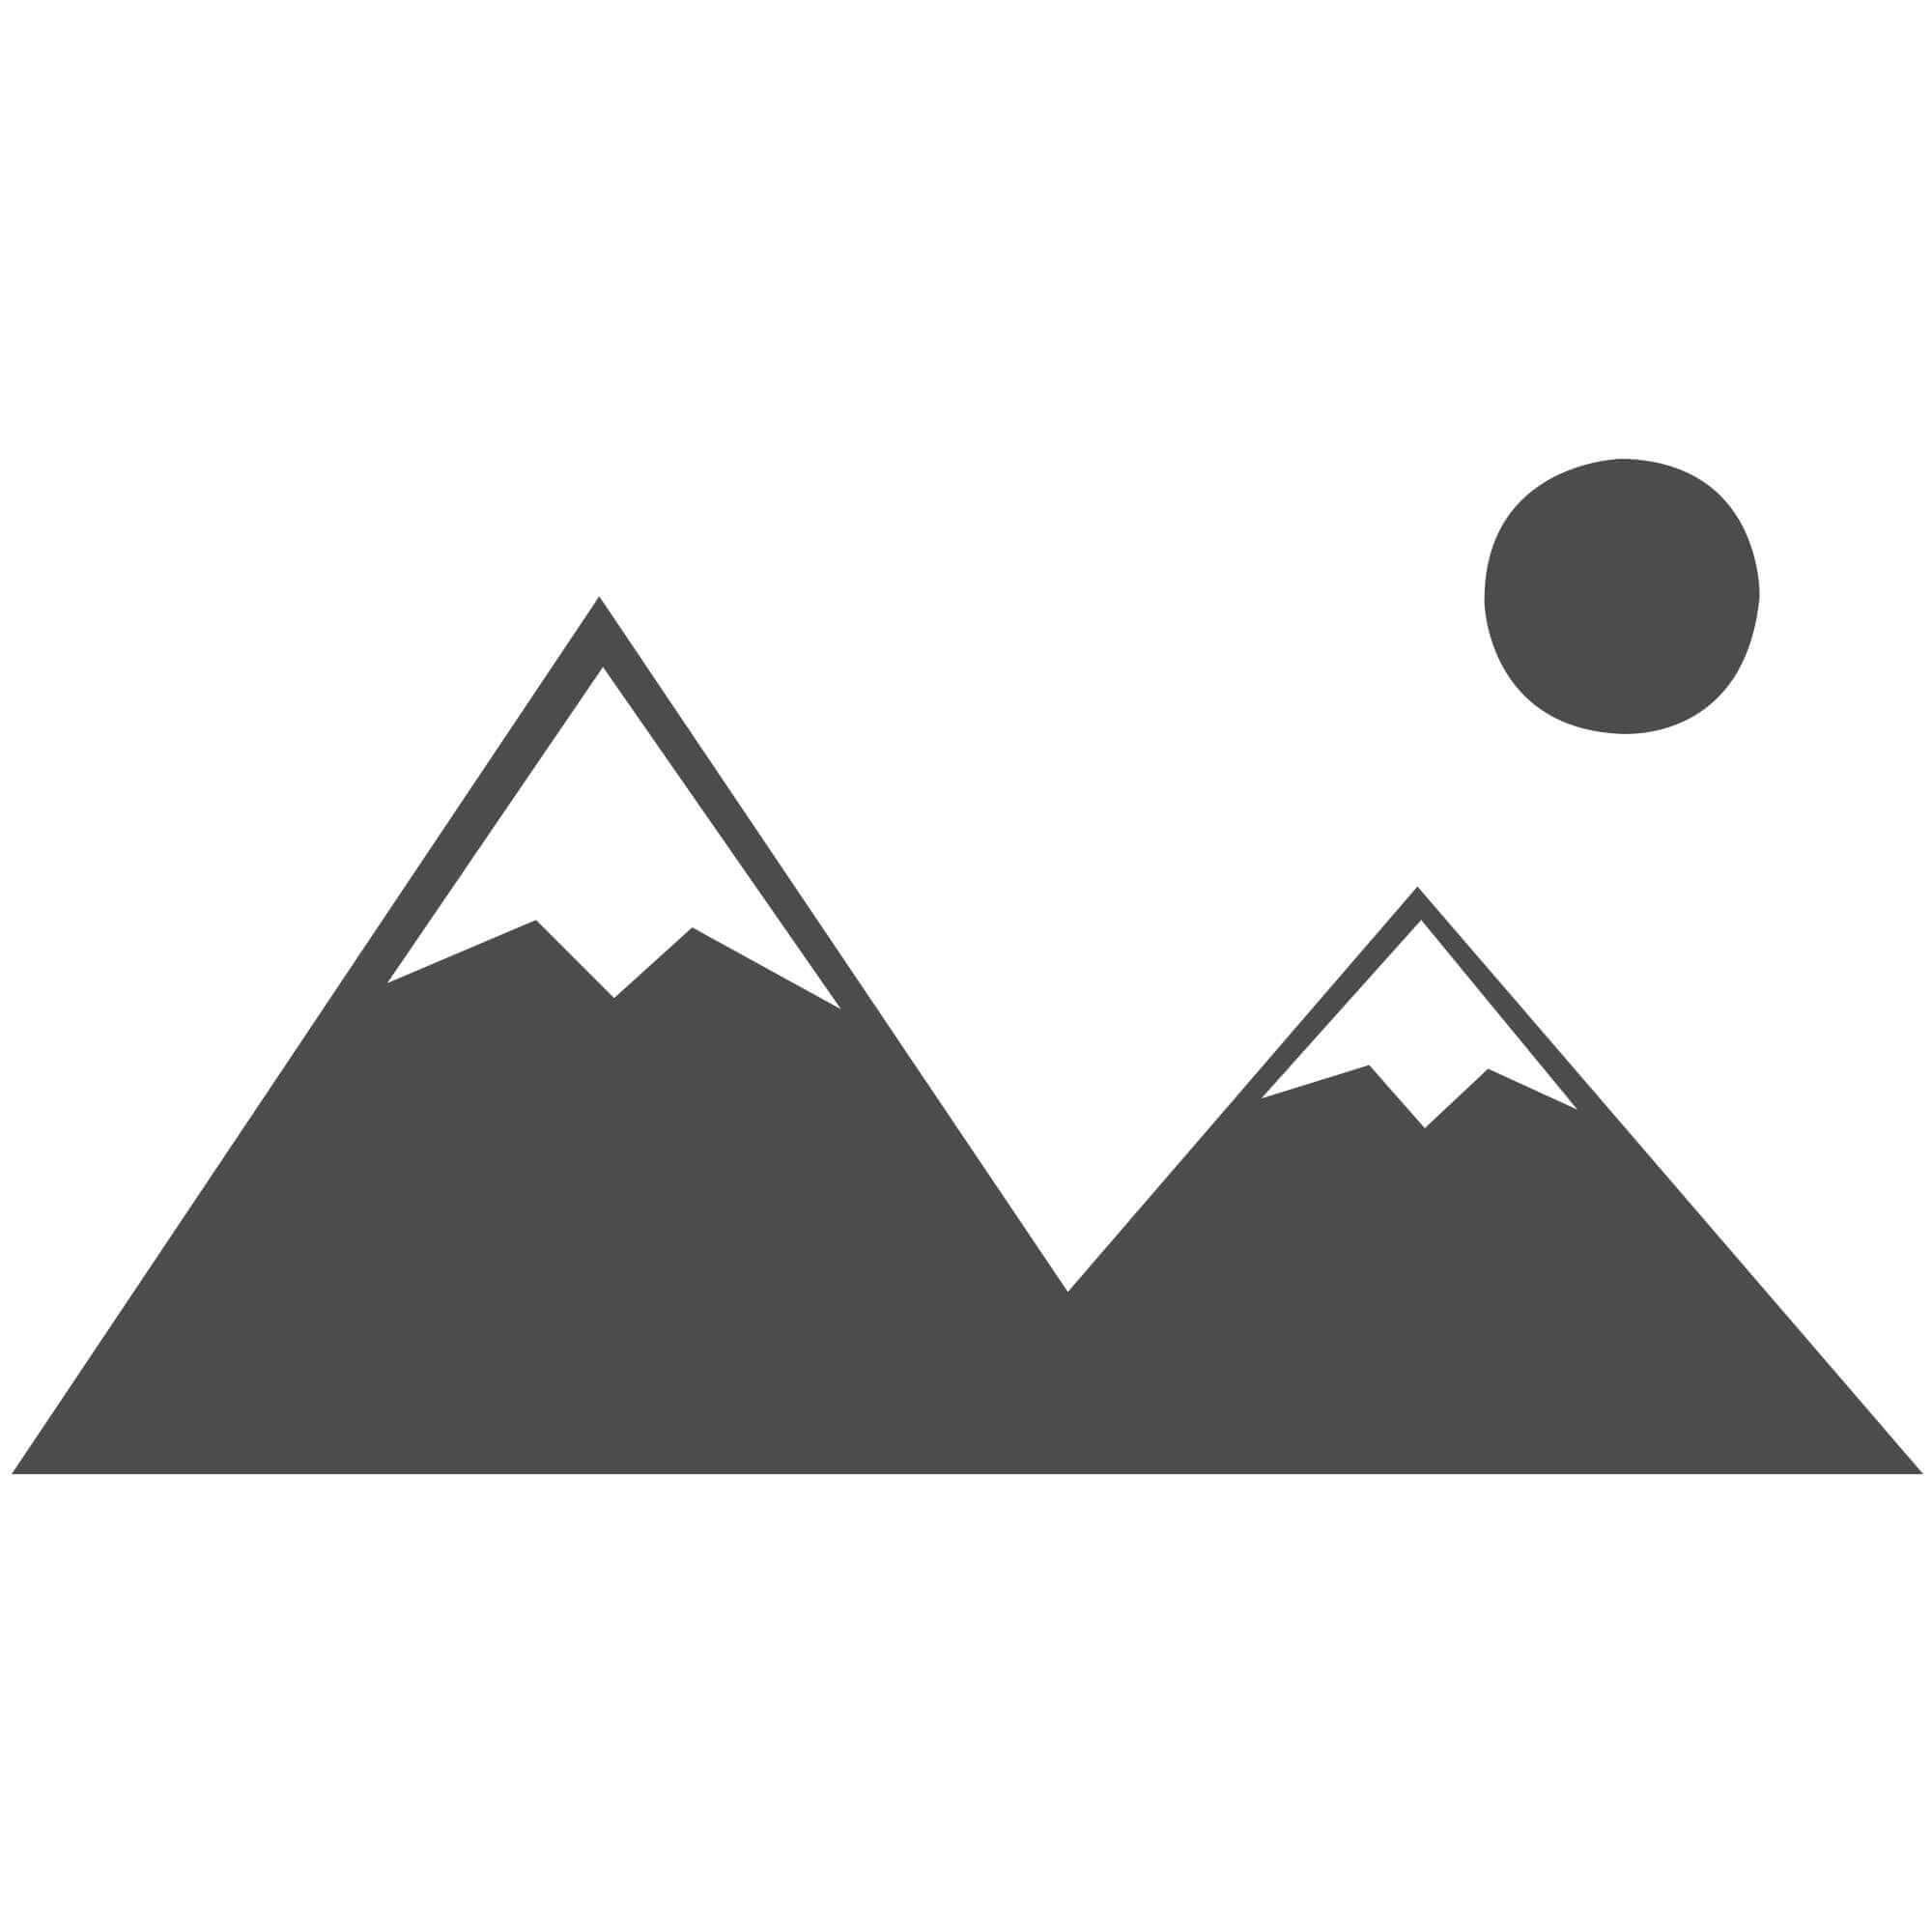 "Cascade Shaggy Rug - Violet - Size 65 x 135 cm (2'2"" x 4'5"")"